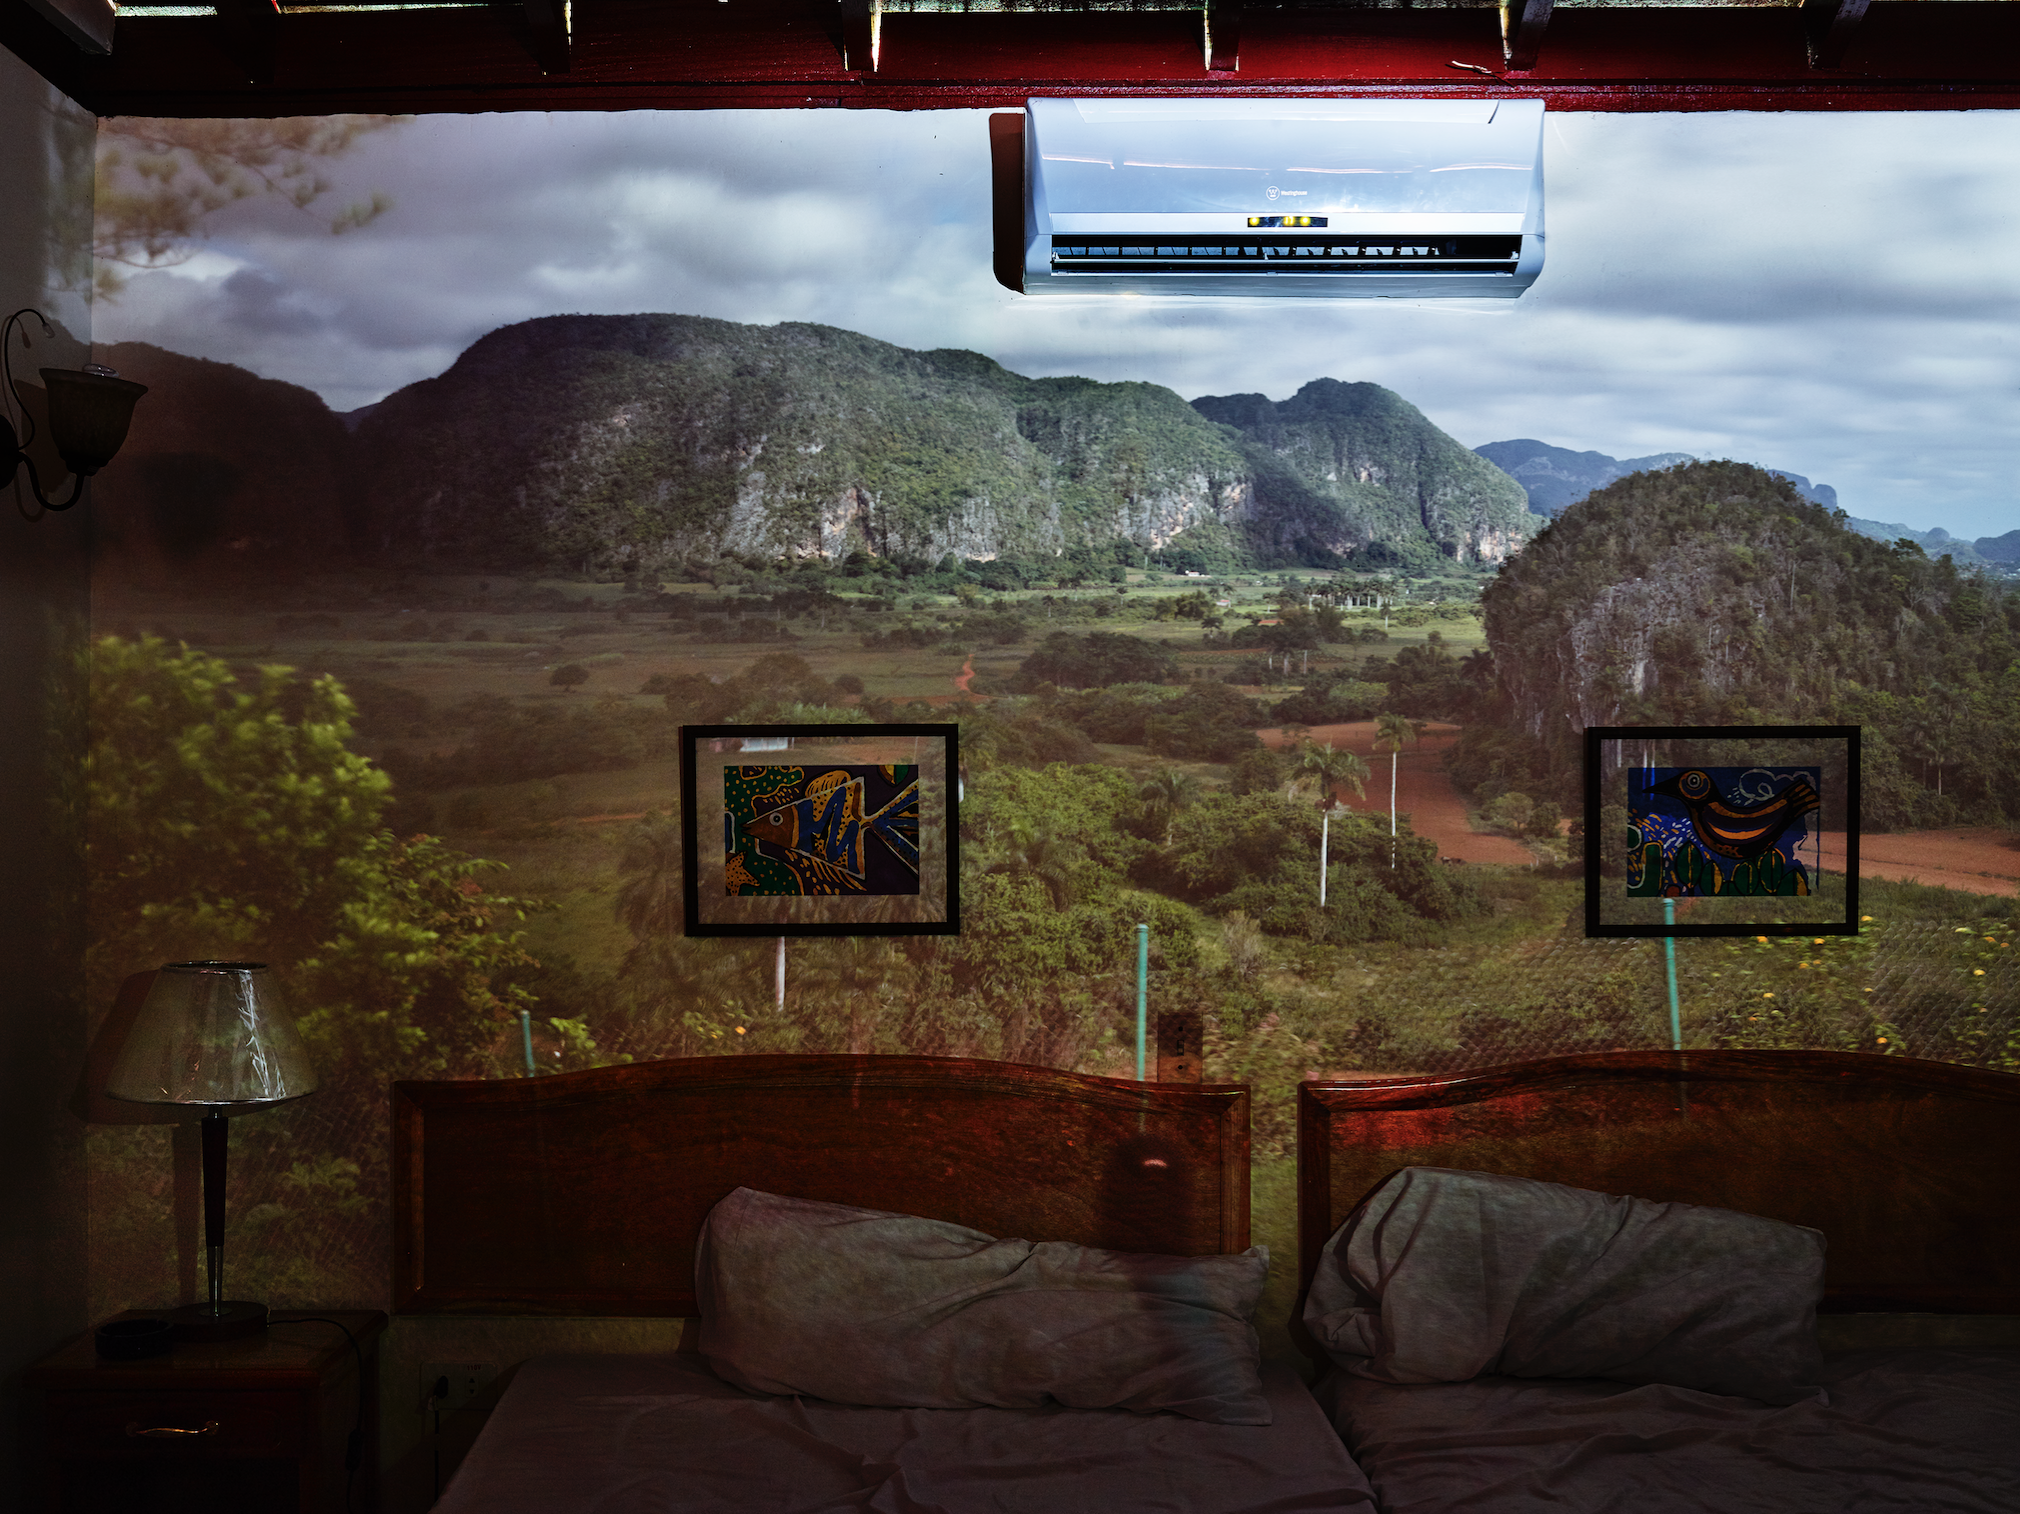 Abelardo Morell, Camera Obscura:  View of Valle de Viñales, Pinar del Rio, Cuba , 2014.